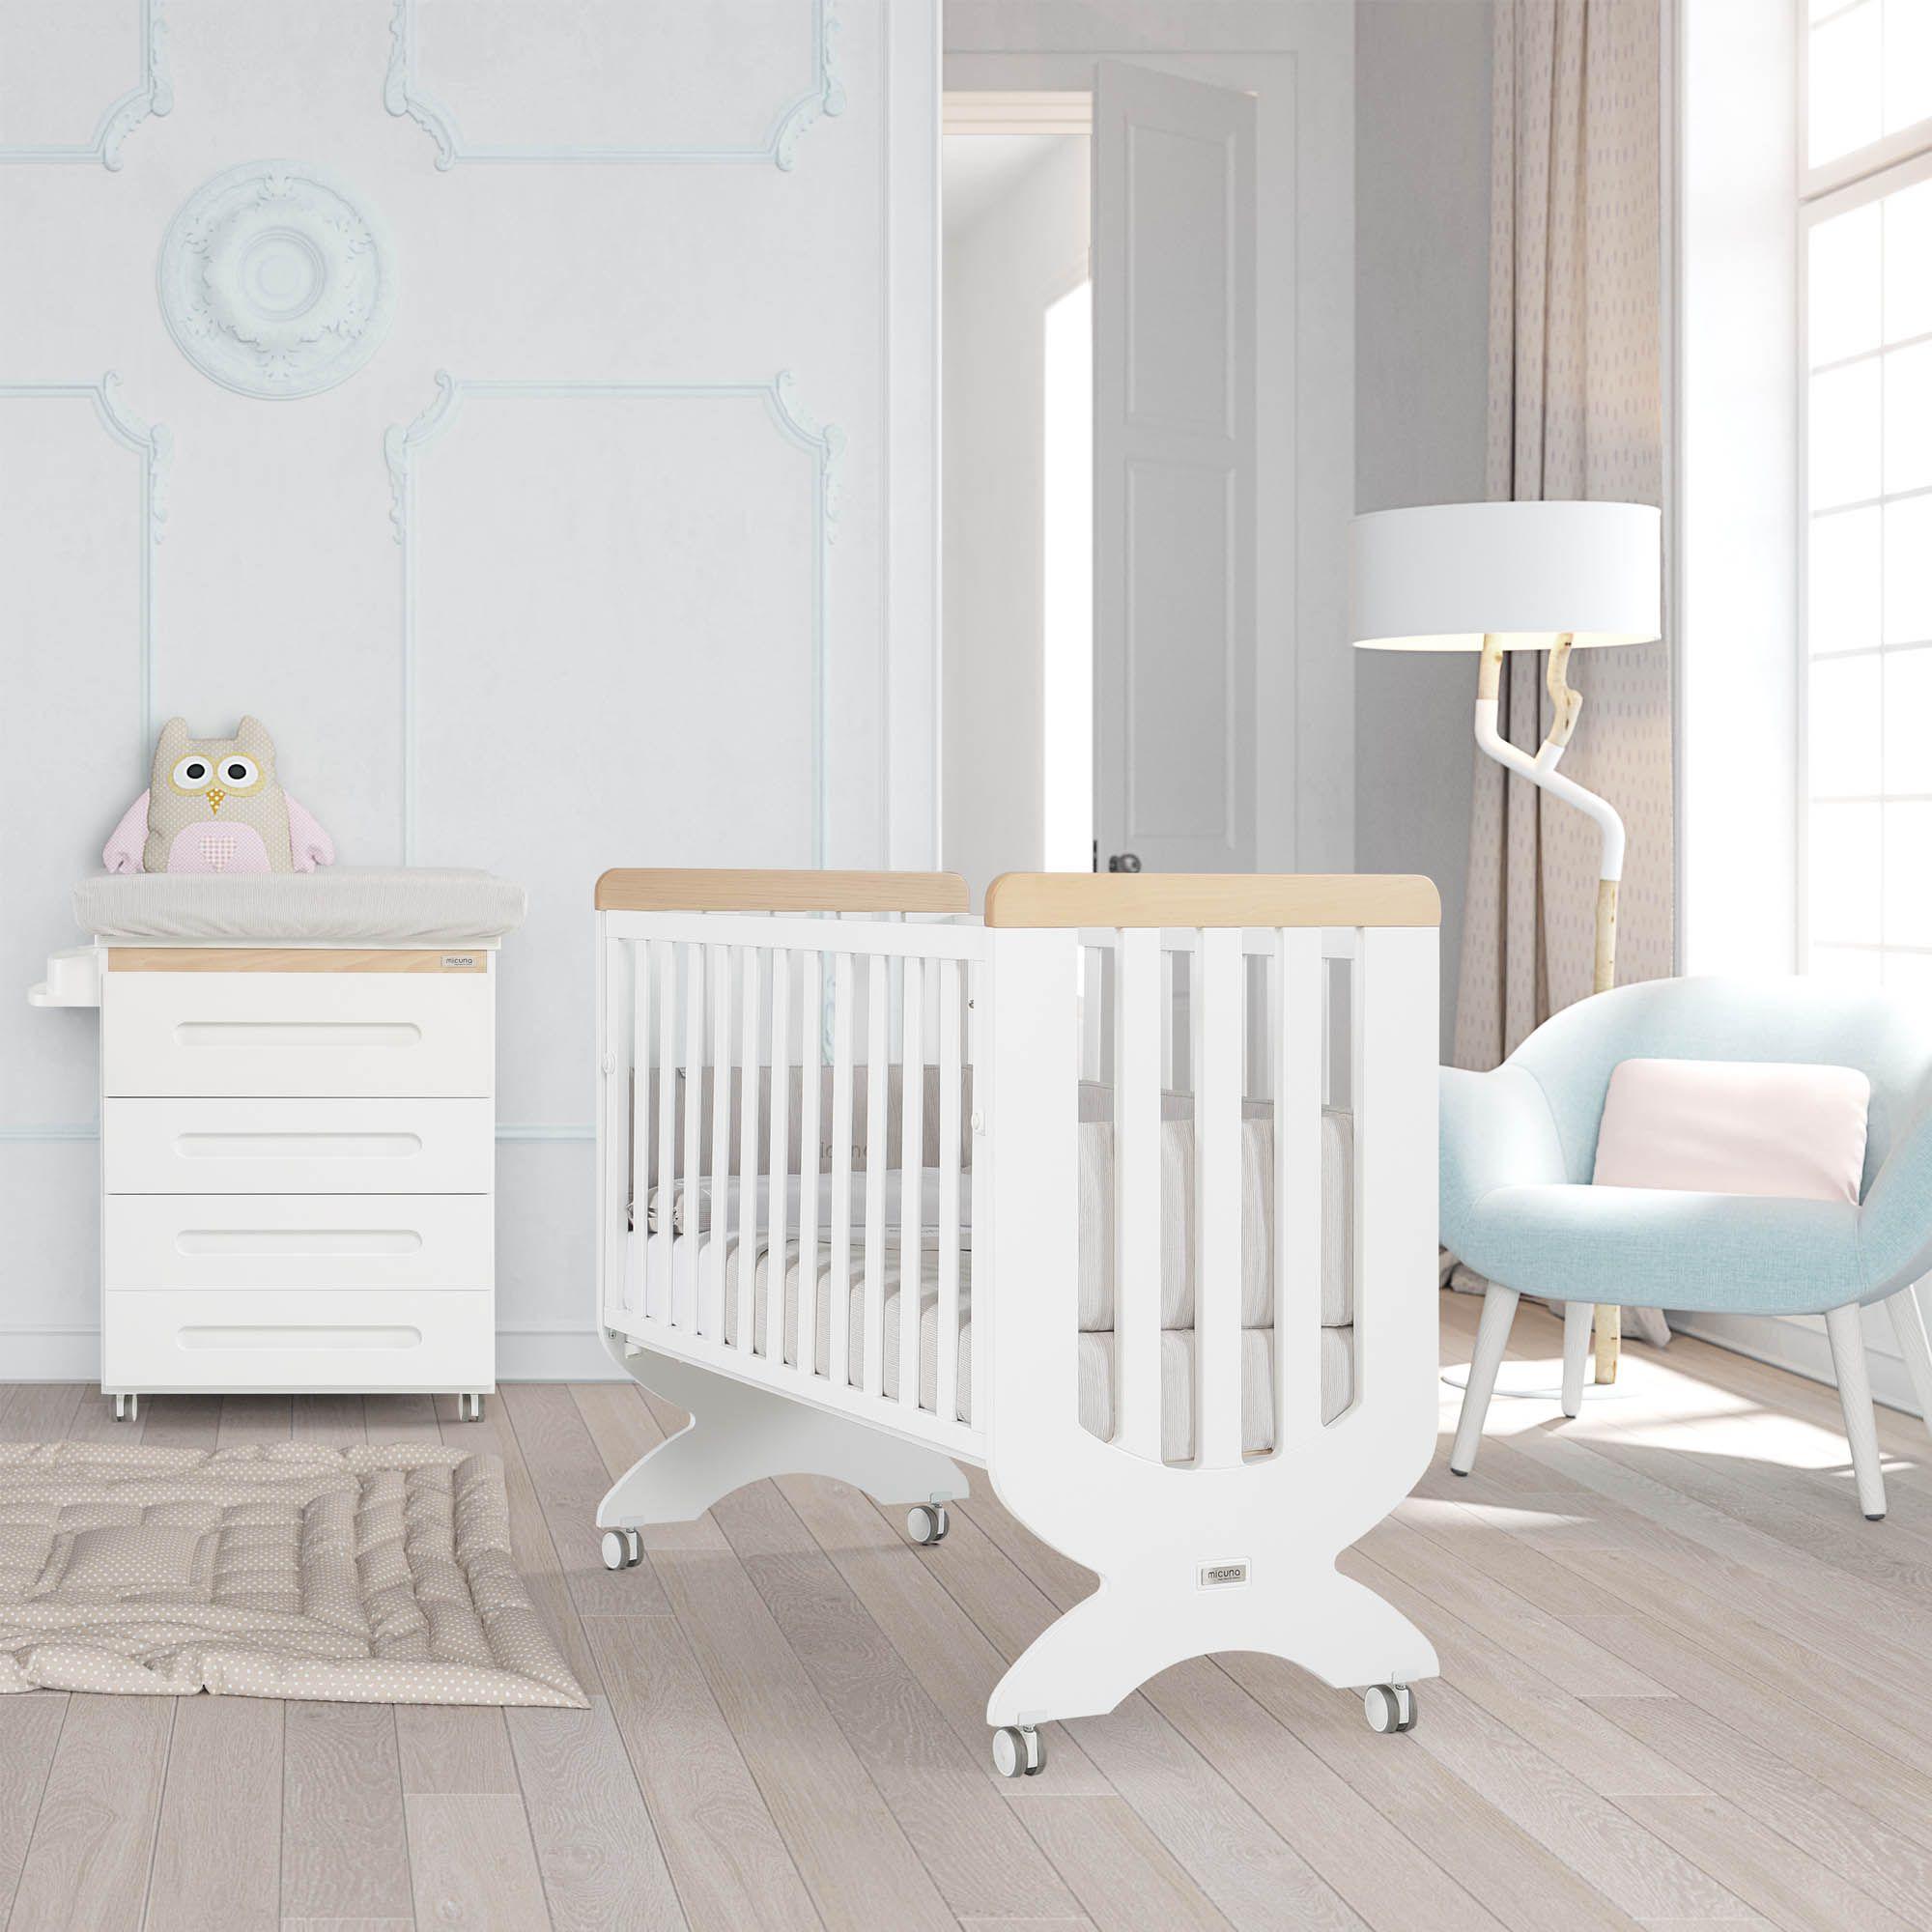 cuna OLIMPIA | S | Pinterest | Olimpia, Muebles infantiles y Infantiles